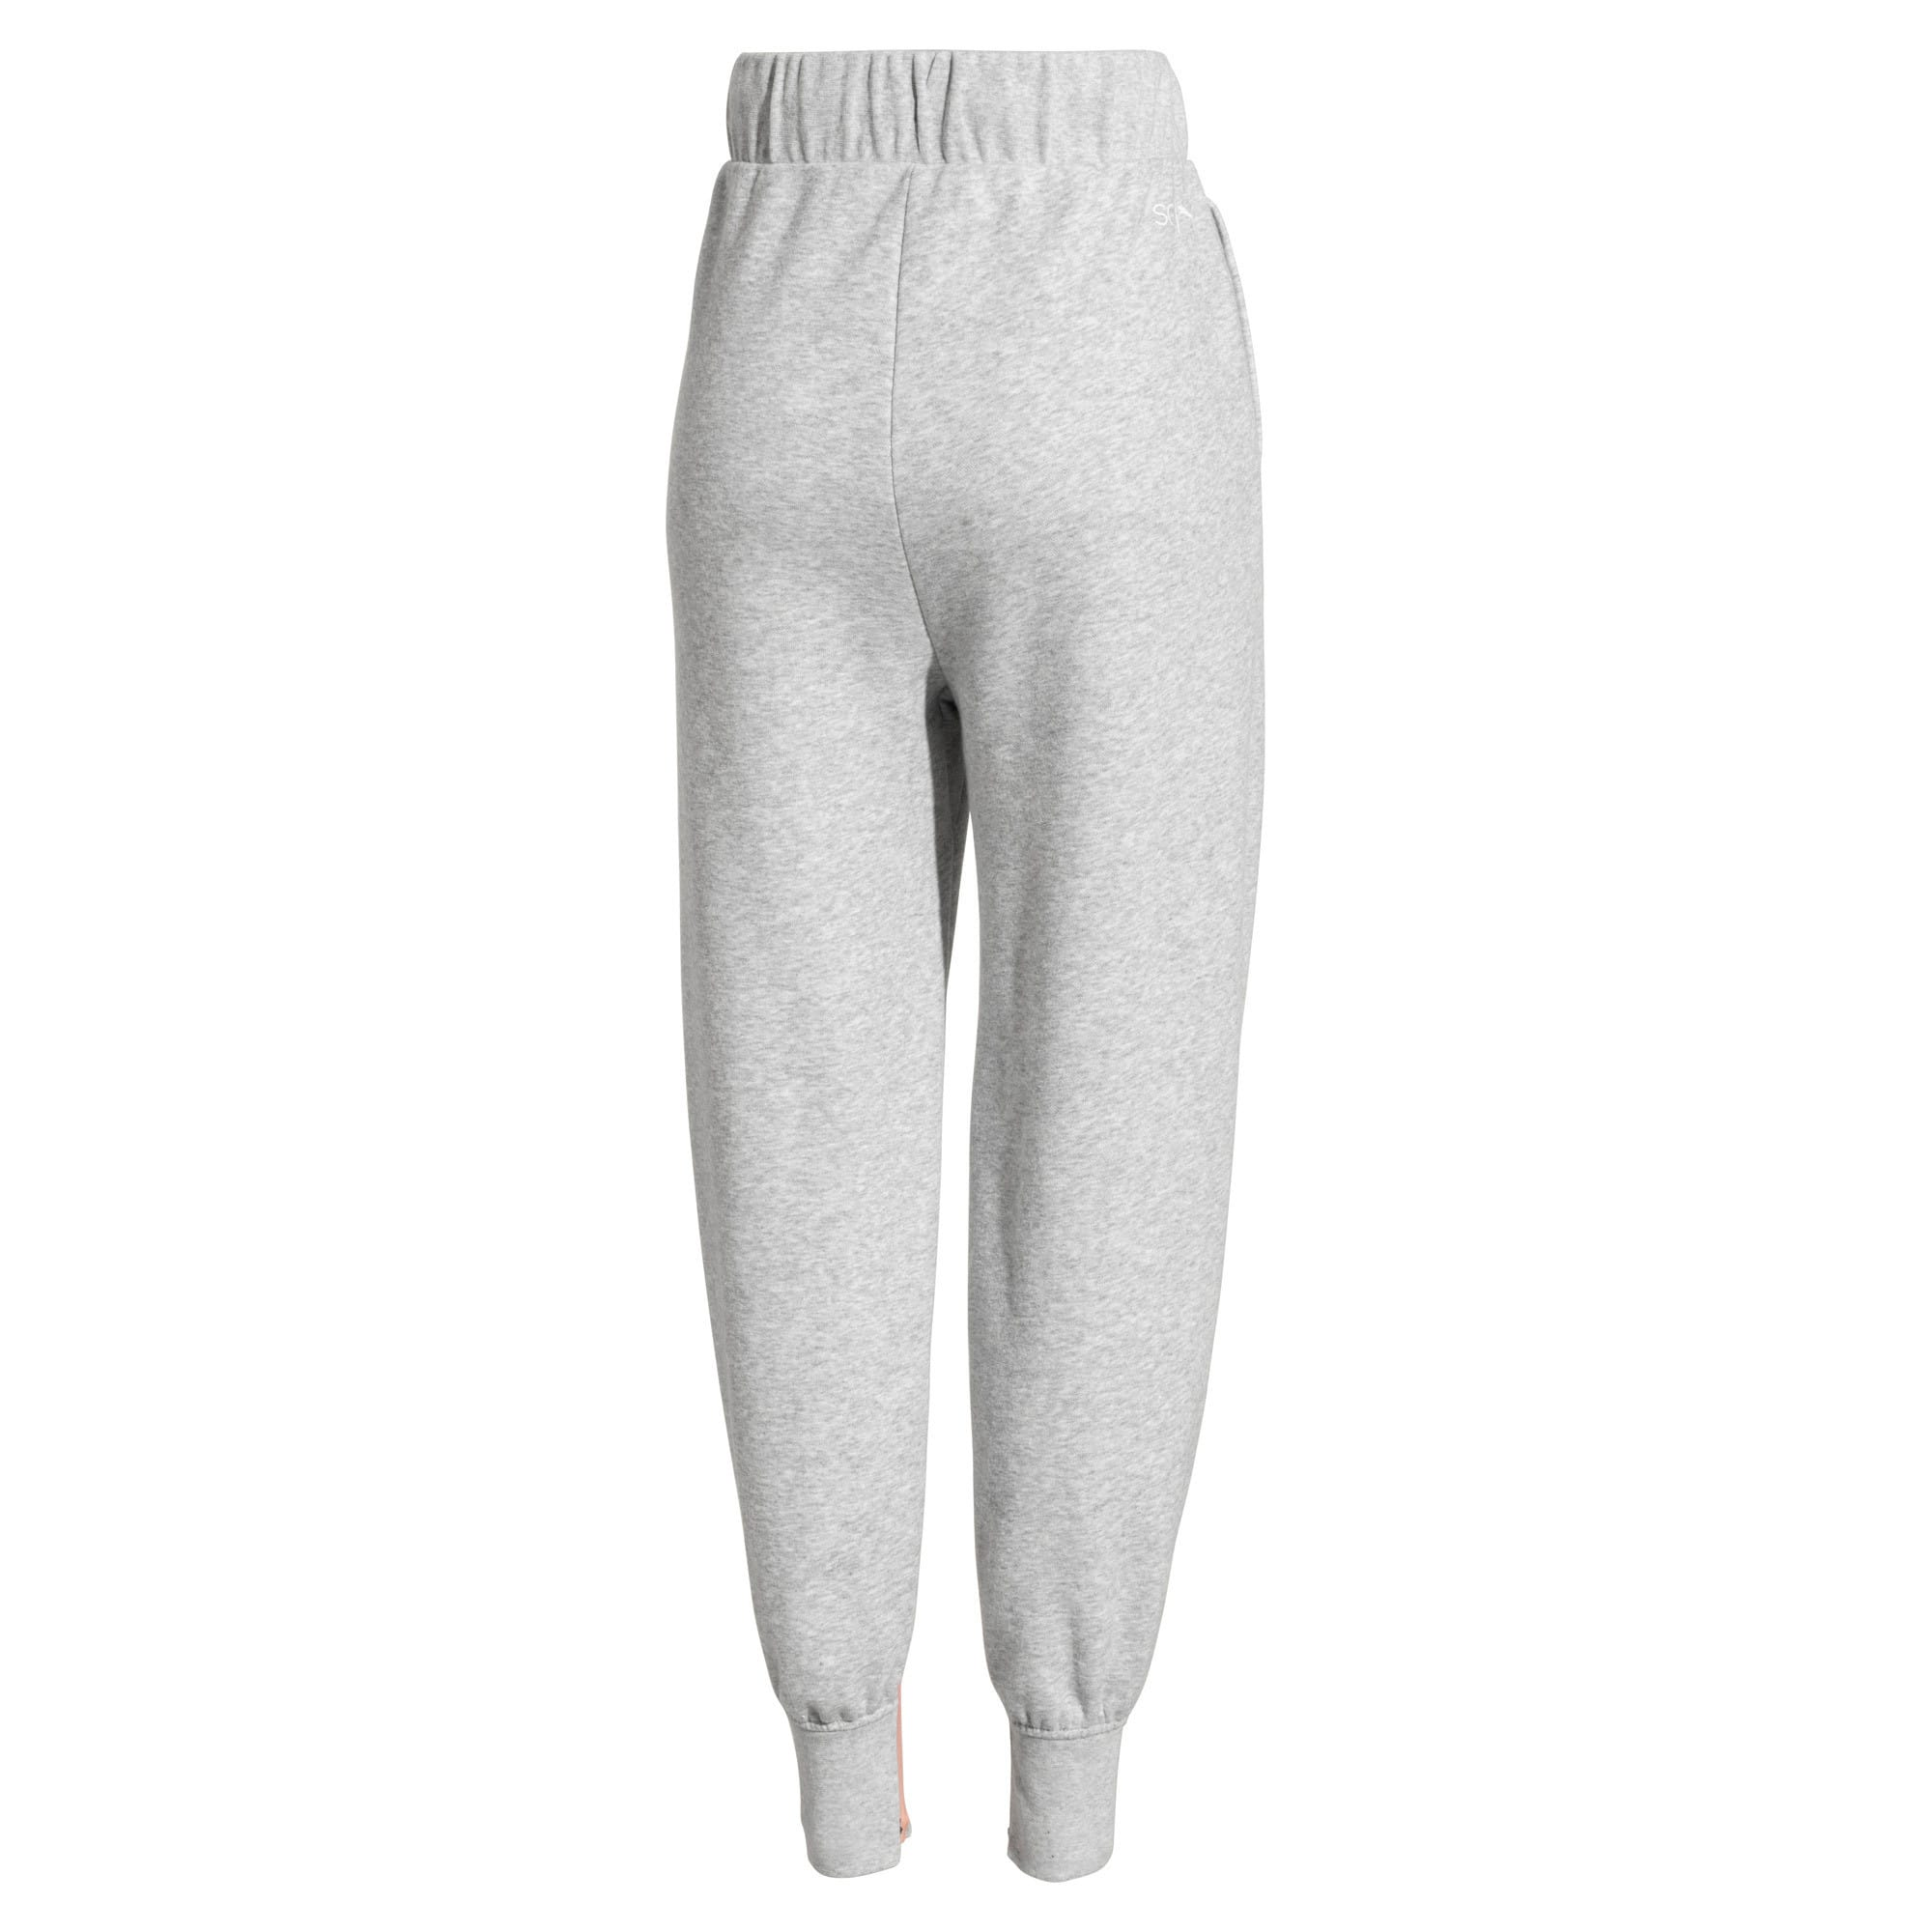 Thumbnail 5 of SG x PUMA Track Pants, Light Gray Heather, medium